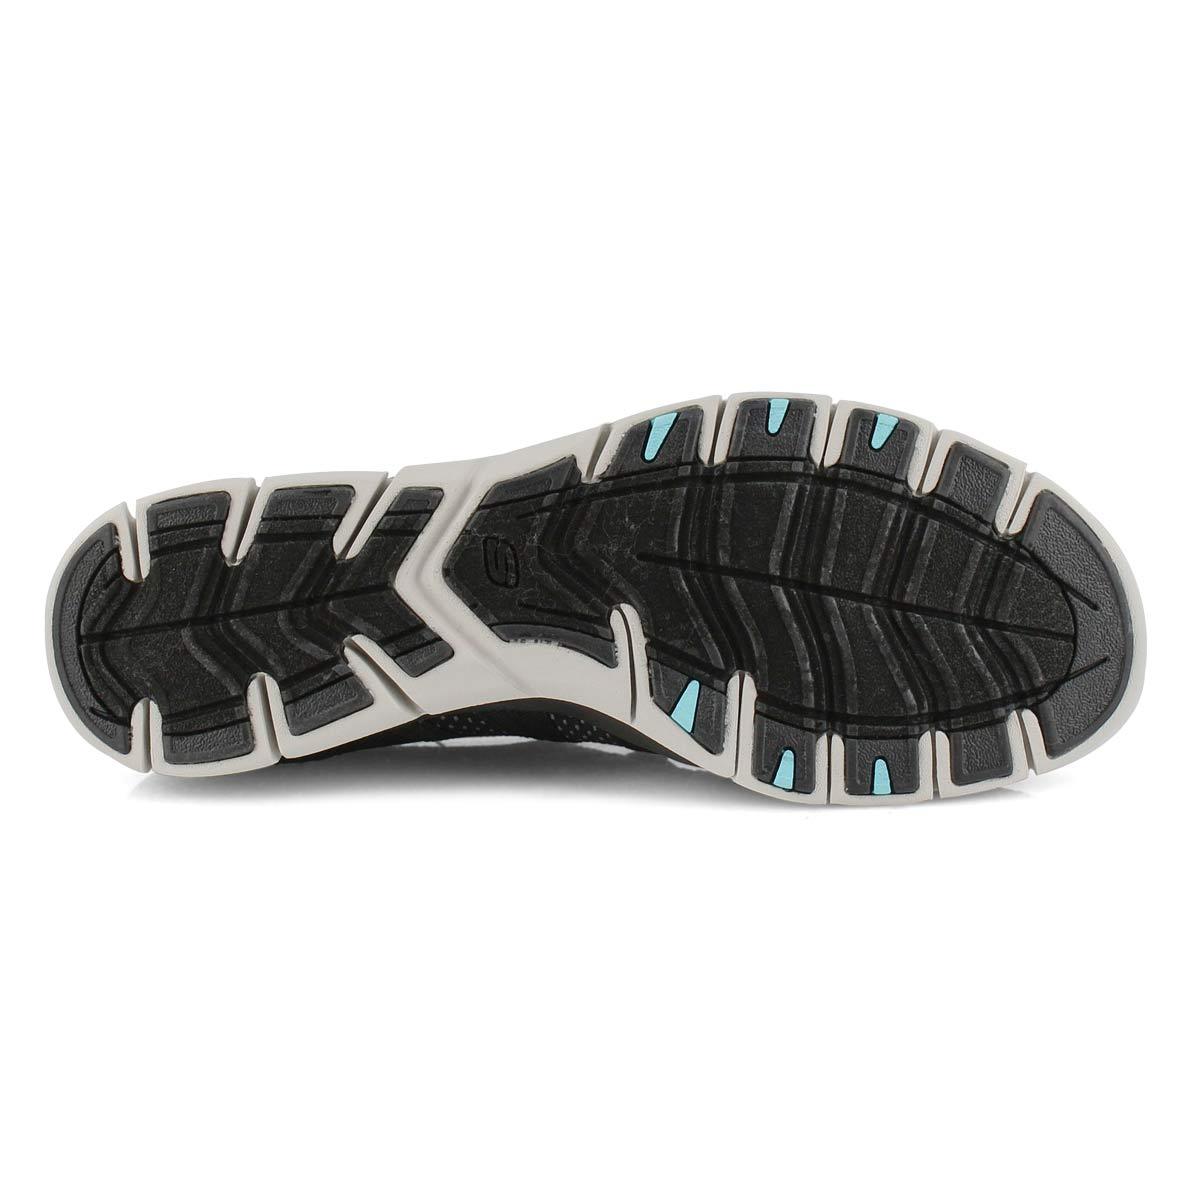 Women's Gratis Chic Newness Shoe - Black